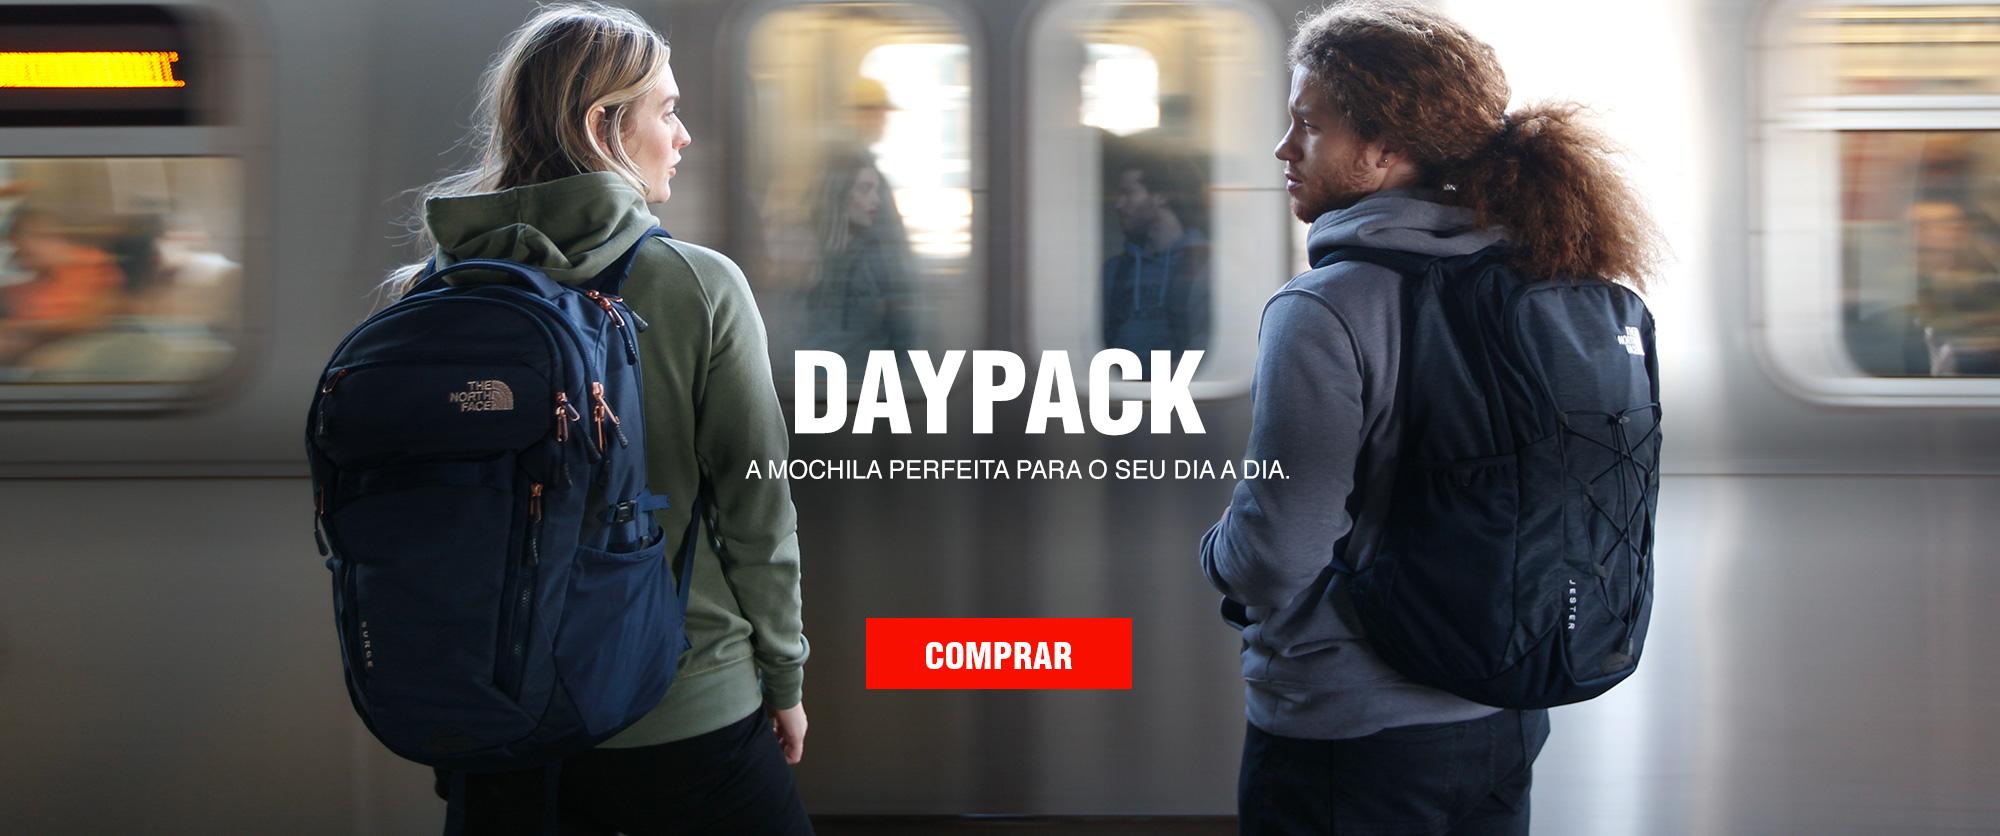 banner-principal-2-20180731 - Daypacks